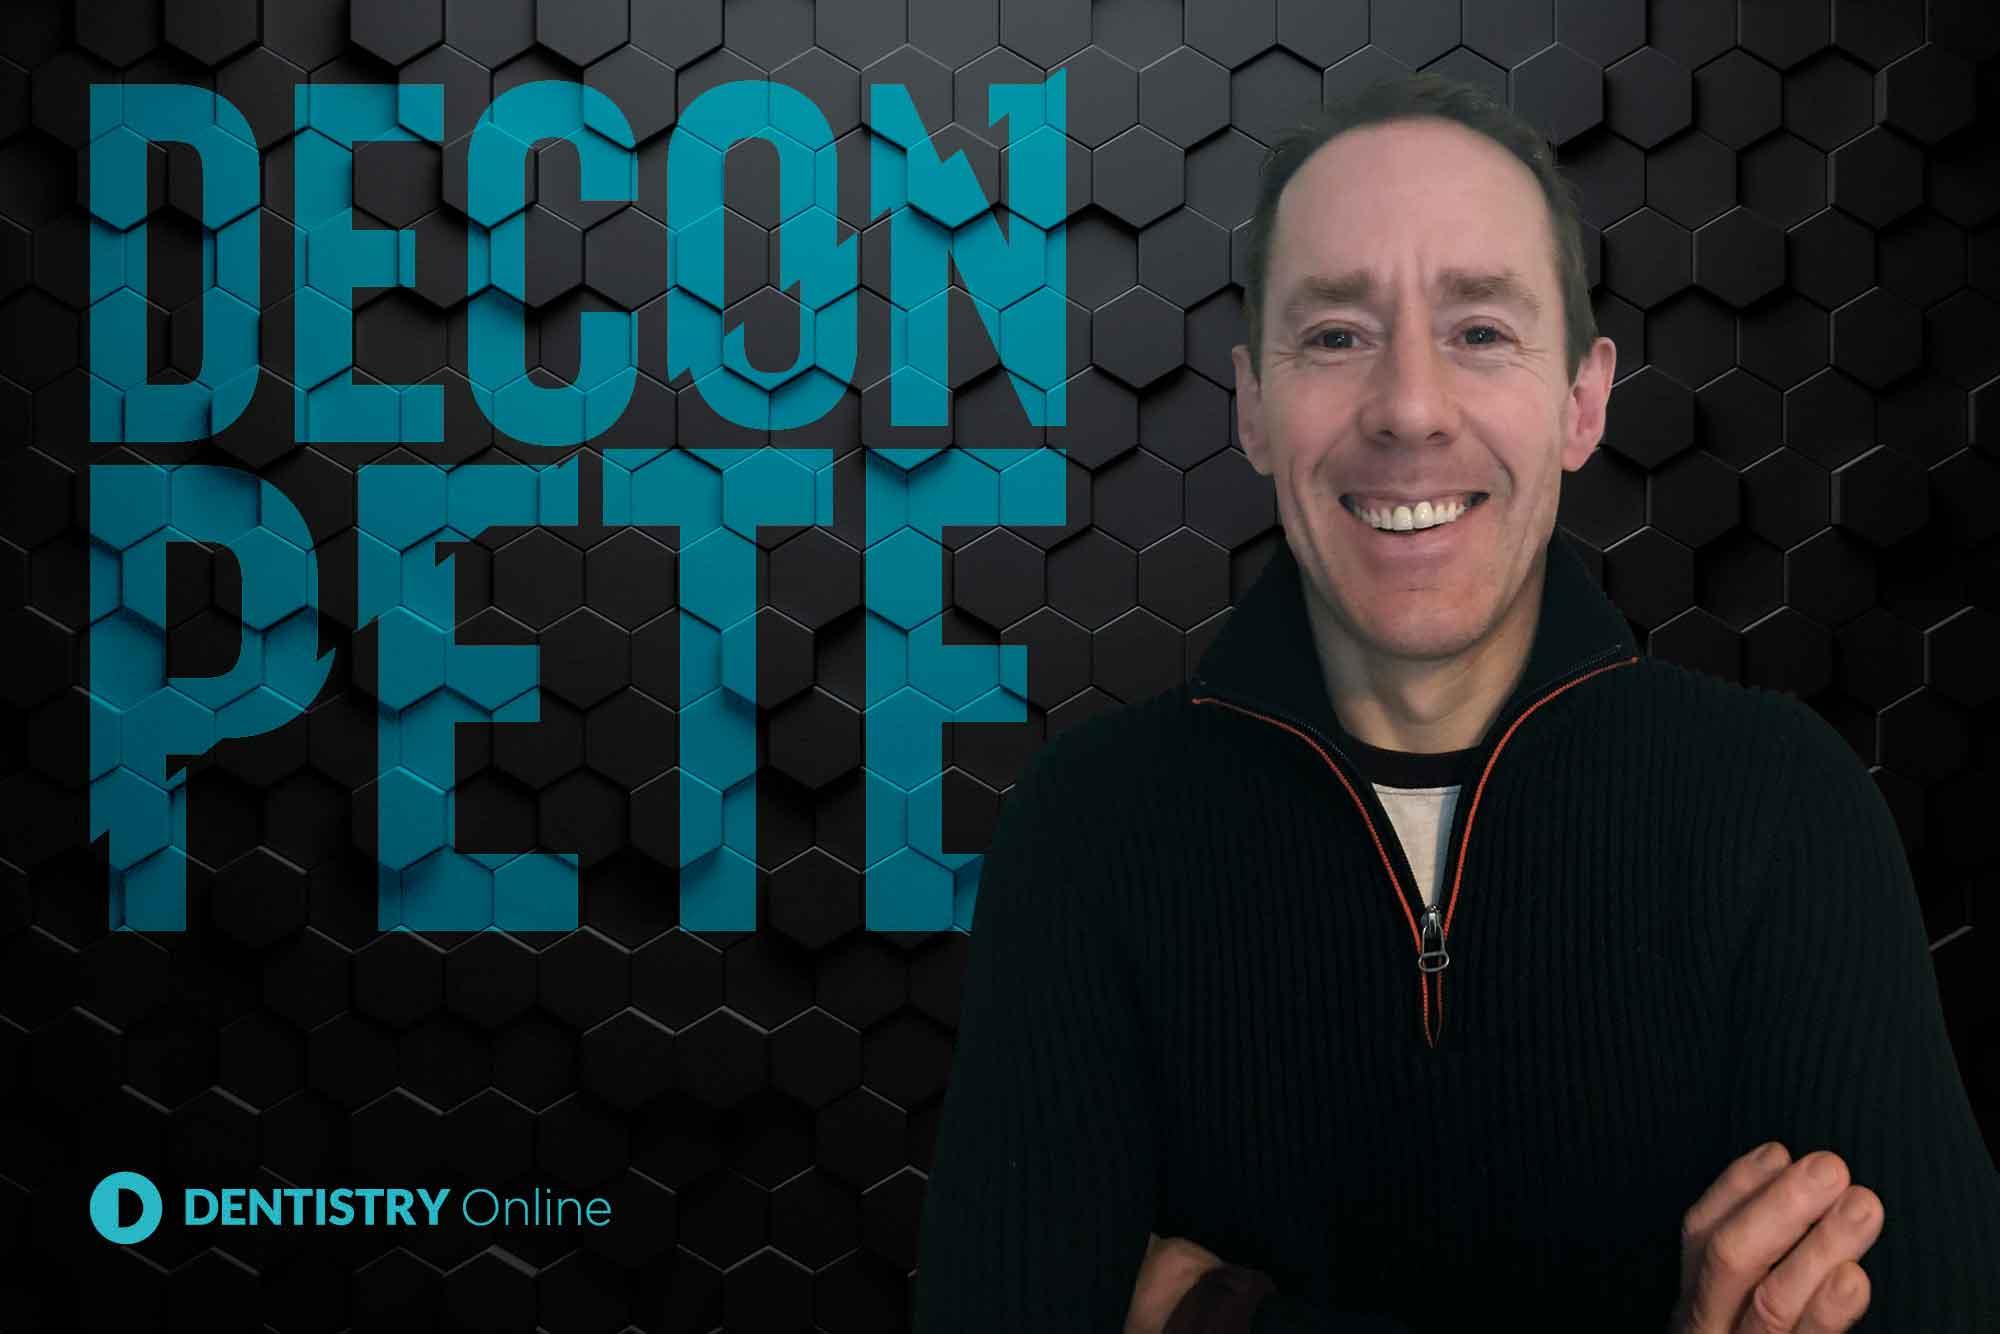 Decon Pete ACH